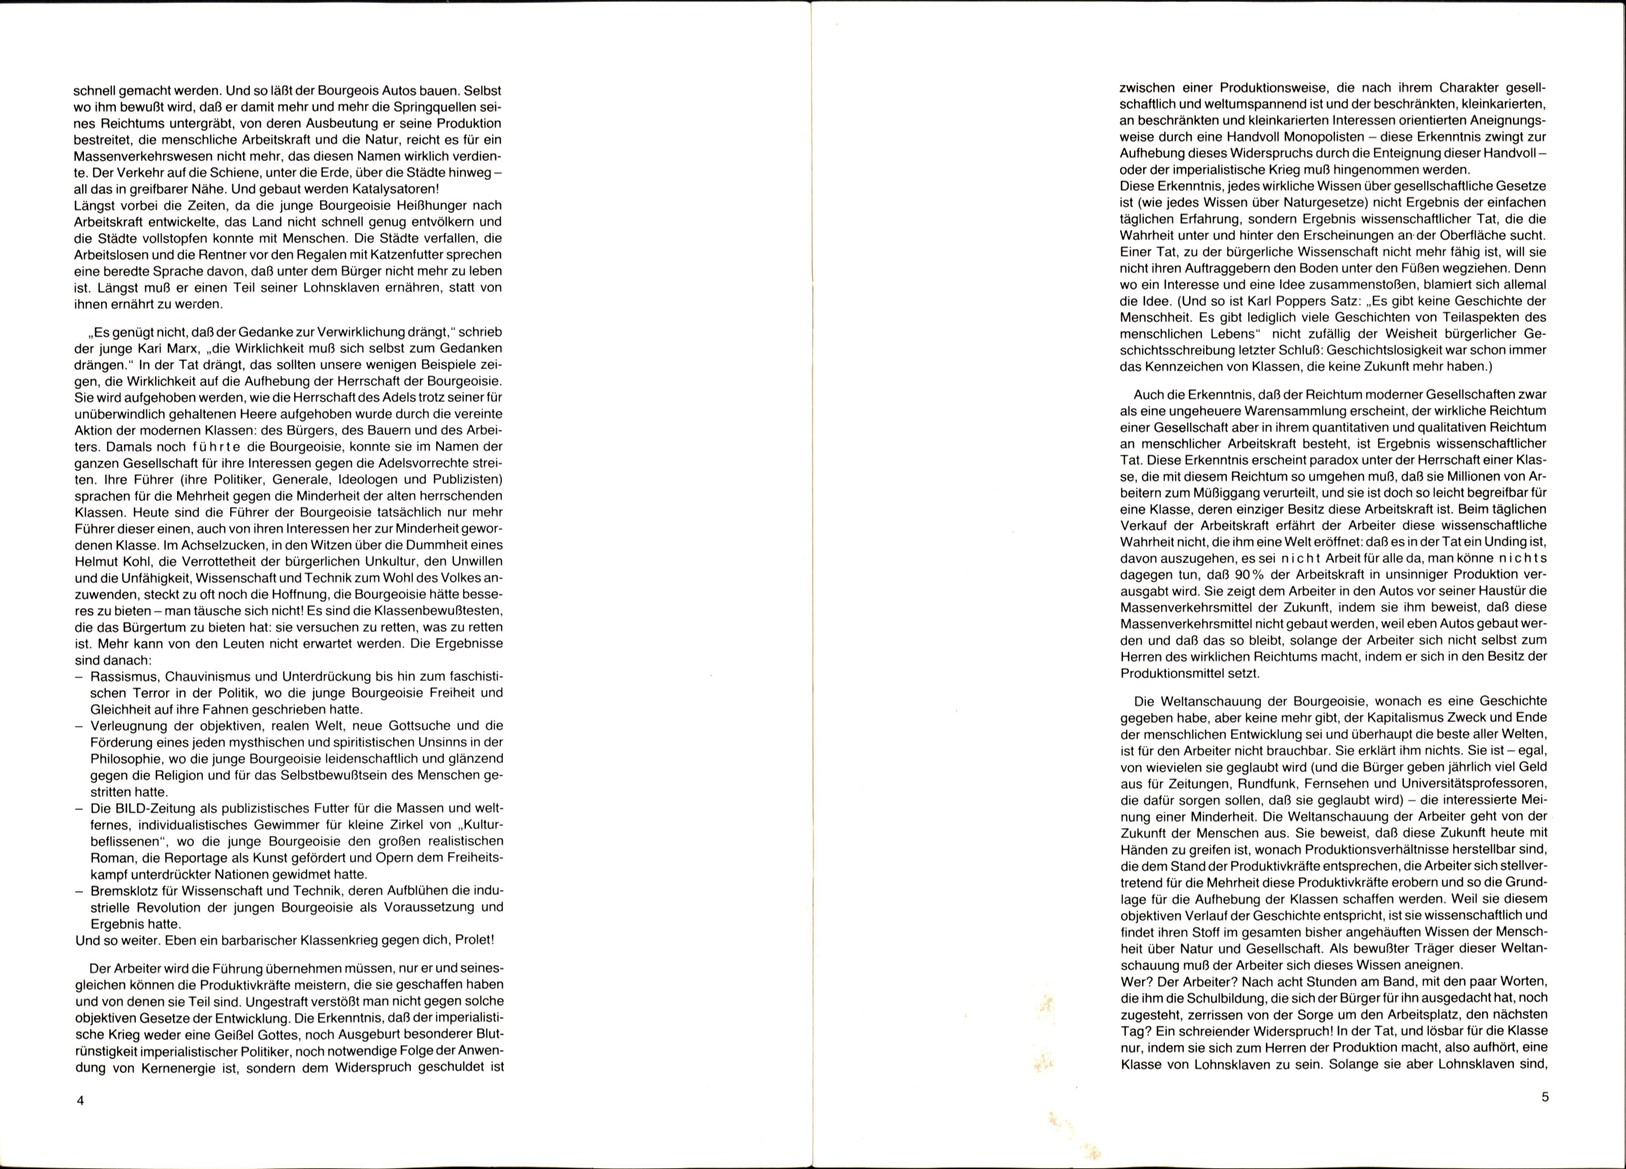 ABG_1985_Beschluesse_IV_Delegiertenkonferenz_04